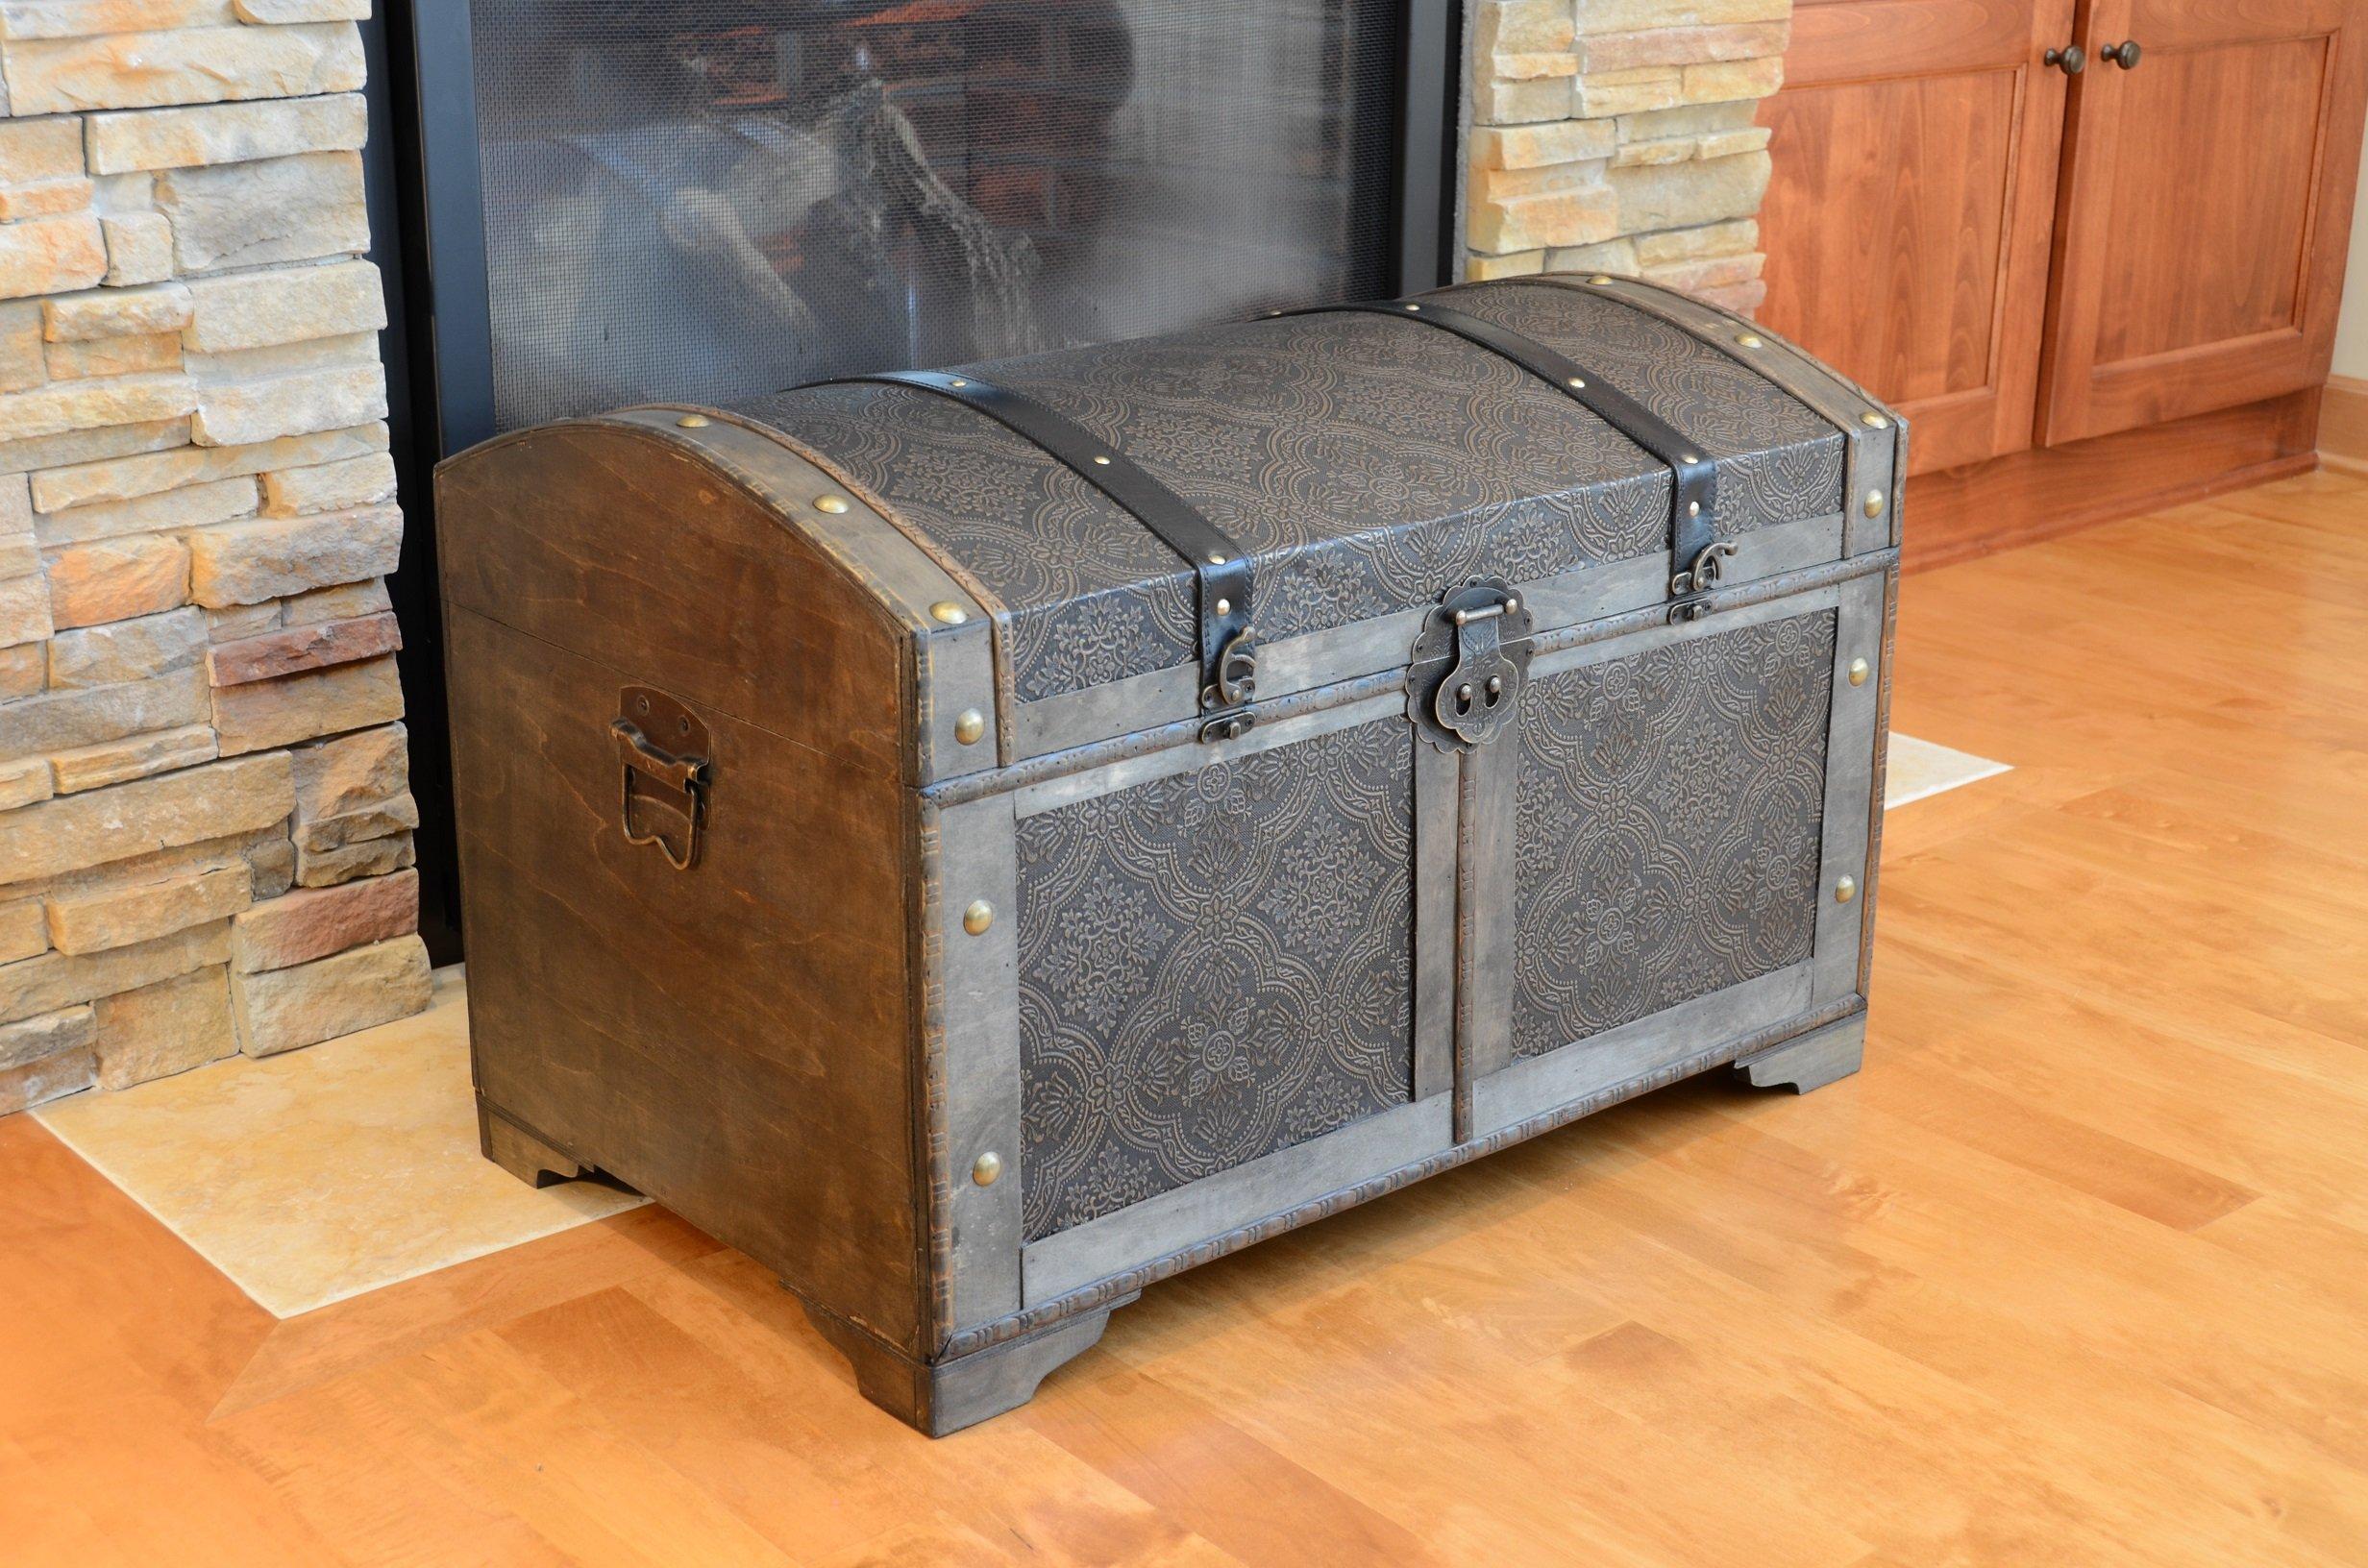 Nostalgic Medium Wood Storage Trunk Wooden Treasure Chest by Styled Shopping